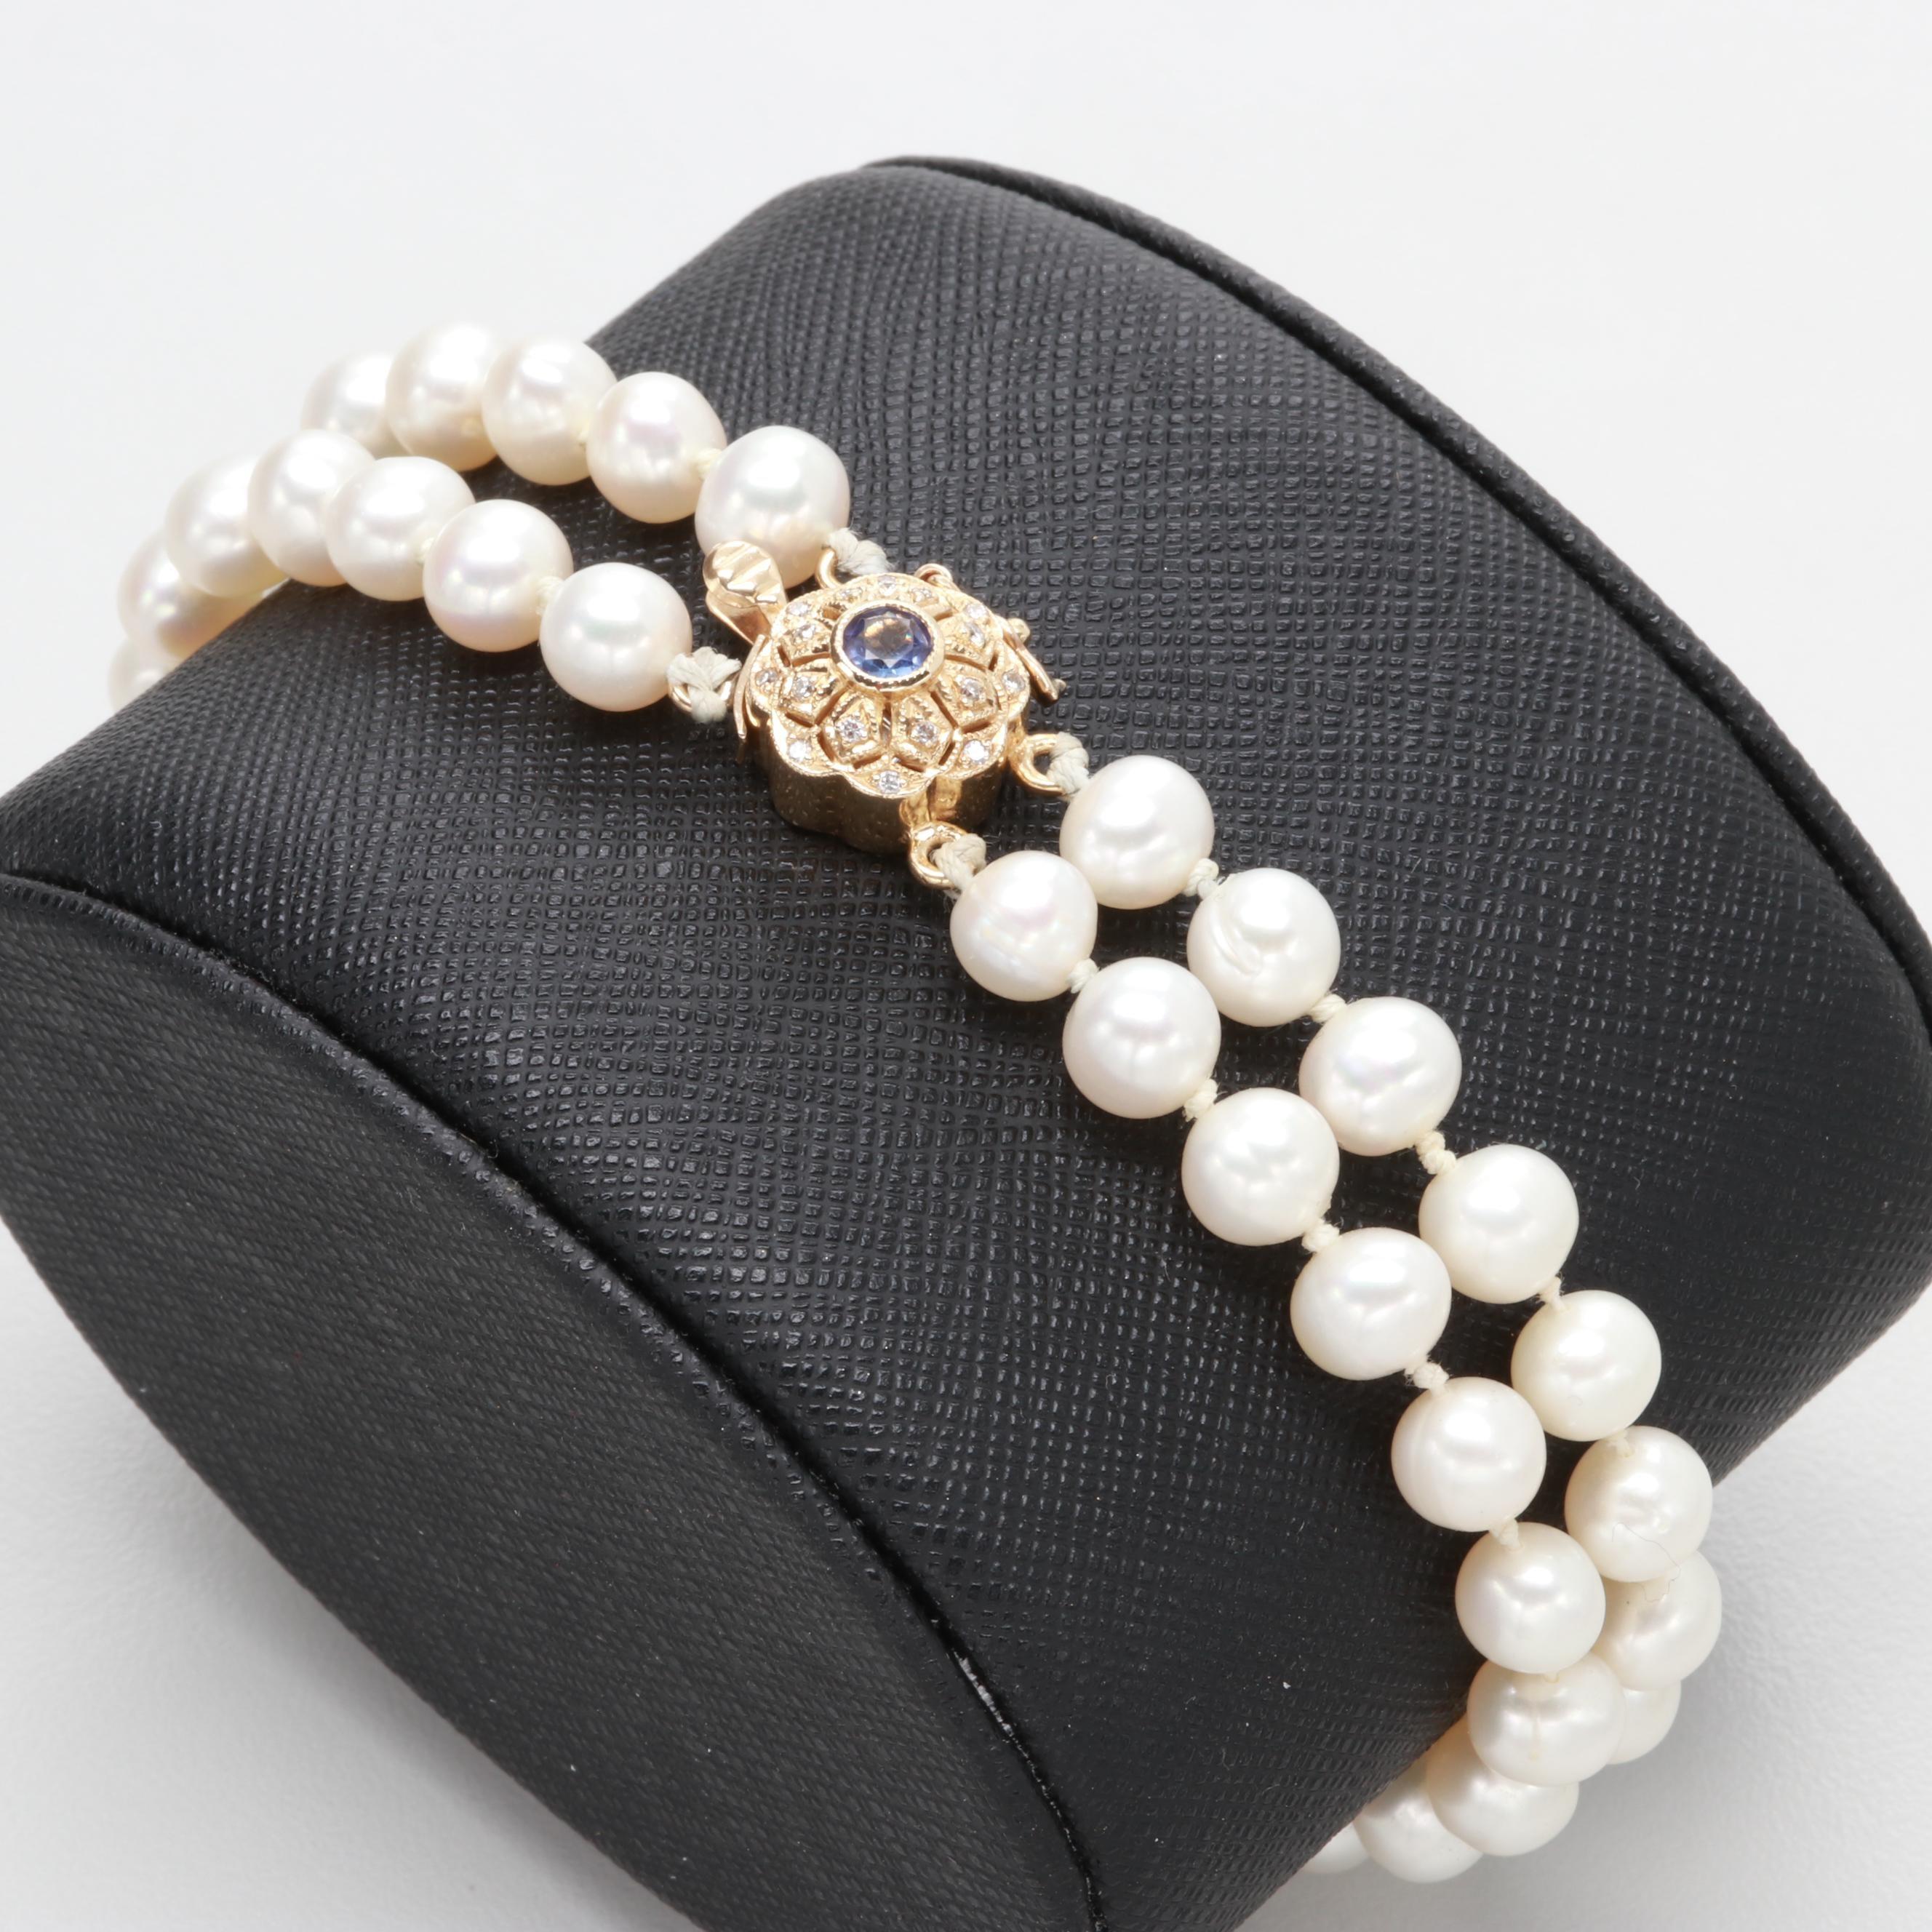 14K Yellow Gold Tanzanite, Diamond and Cultured Pearl Bracelet